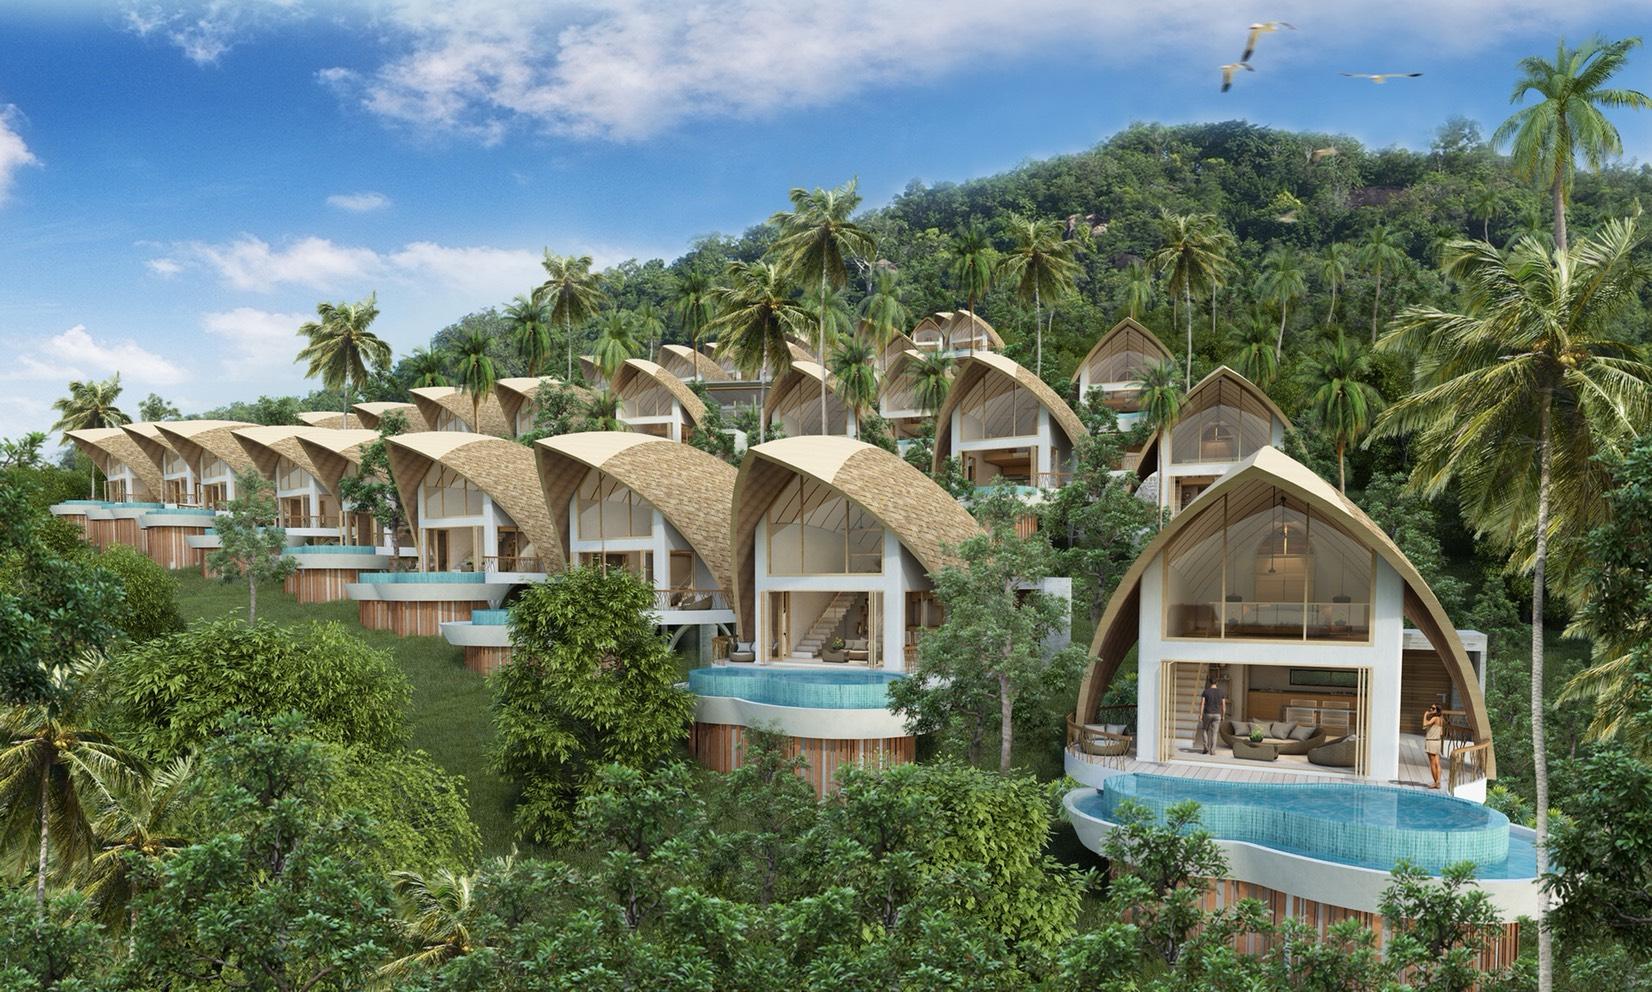 Samui Green Cottages Koh Samui